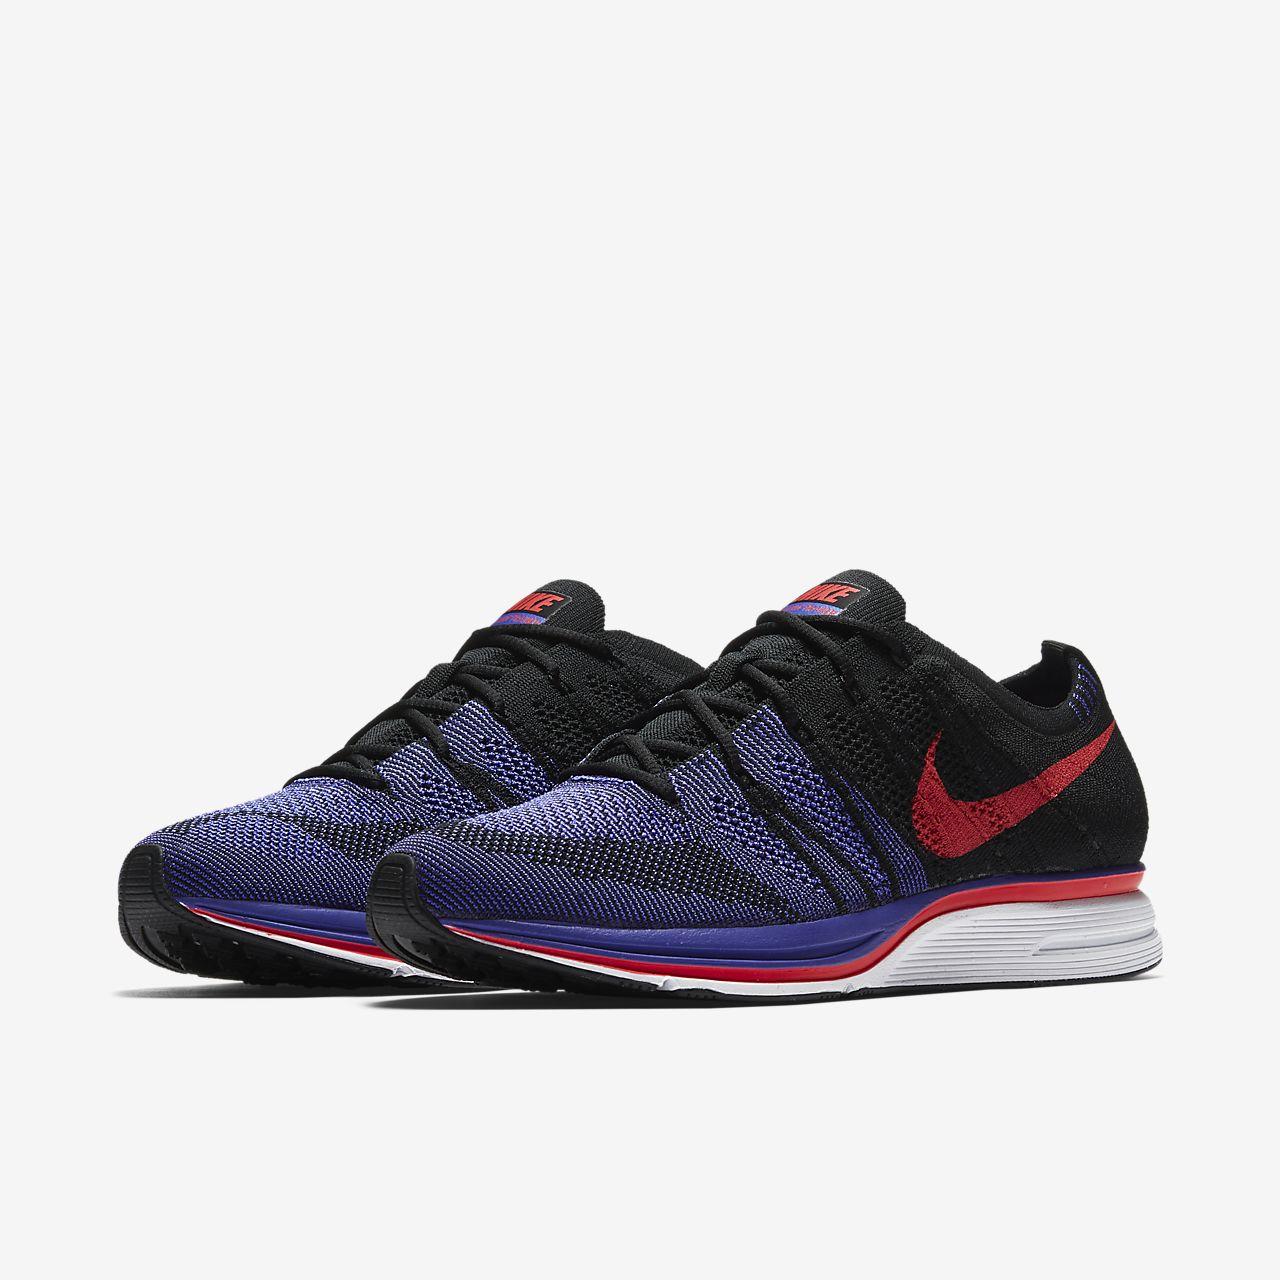 Unisex Nike Nike Flyknit Trainer Schuh 5ARL3j4